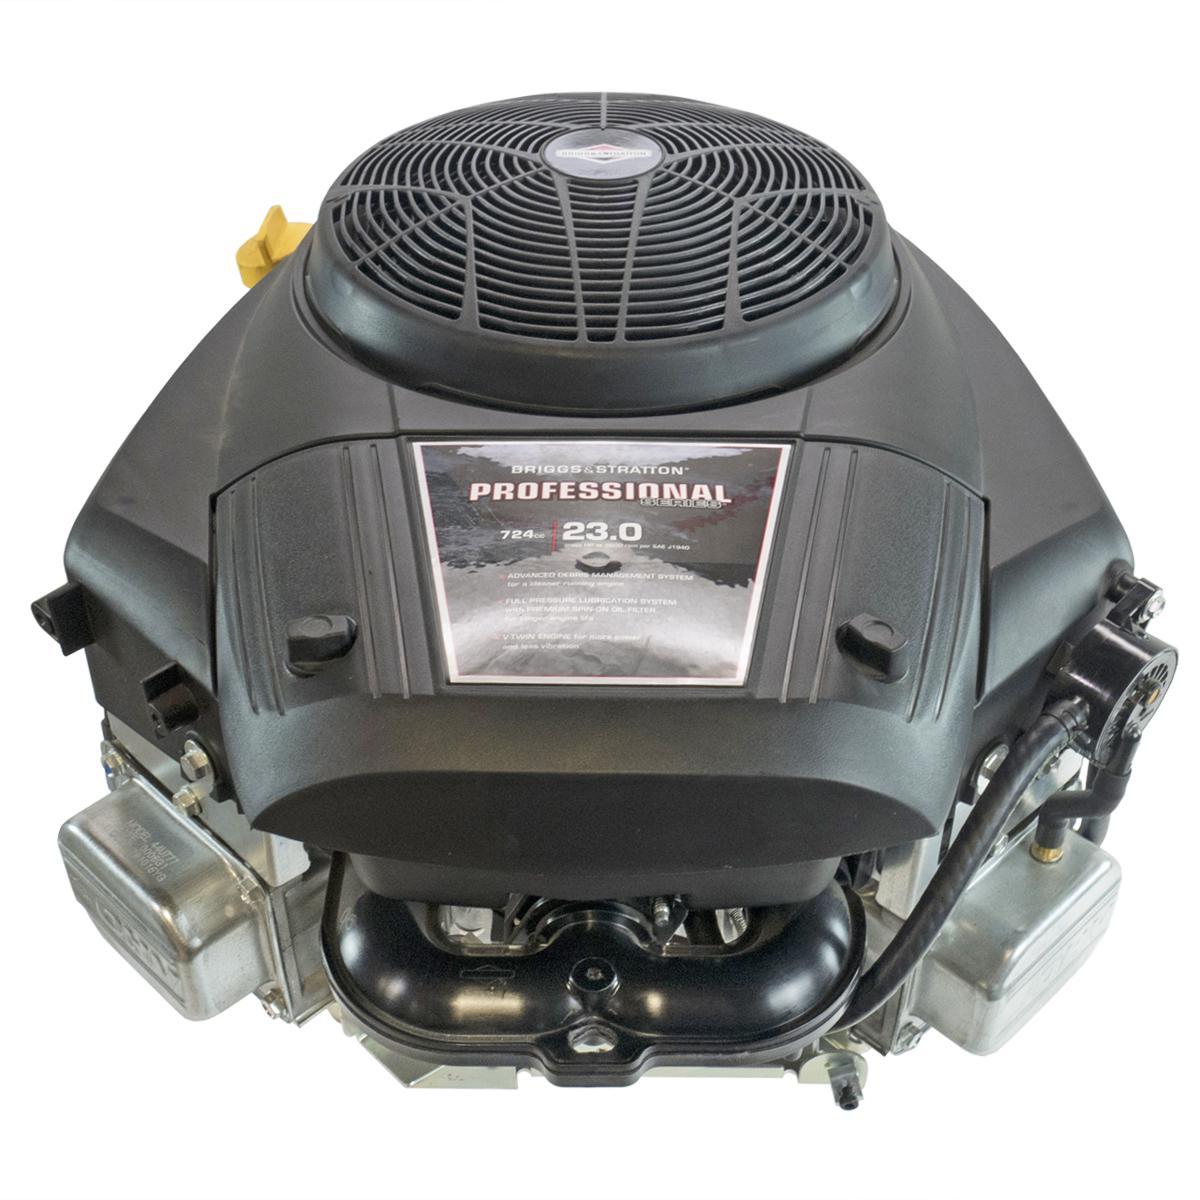 "23hp Professional Vertical 1-1/8""x4-5/16"" Keyed Shaft, Fuel Pump, 16 Amp Alternator, Electric Start, Briggs & Stratton Engine"